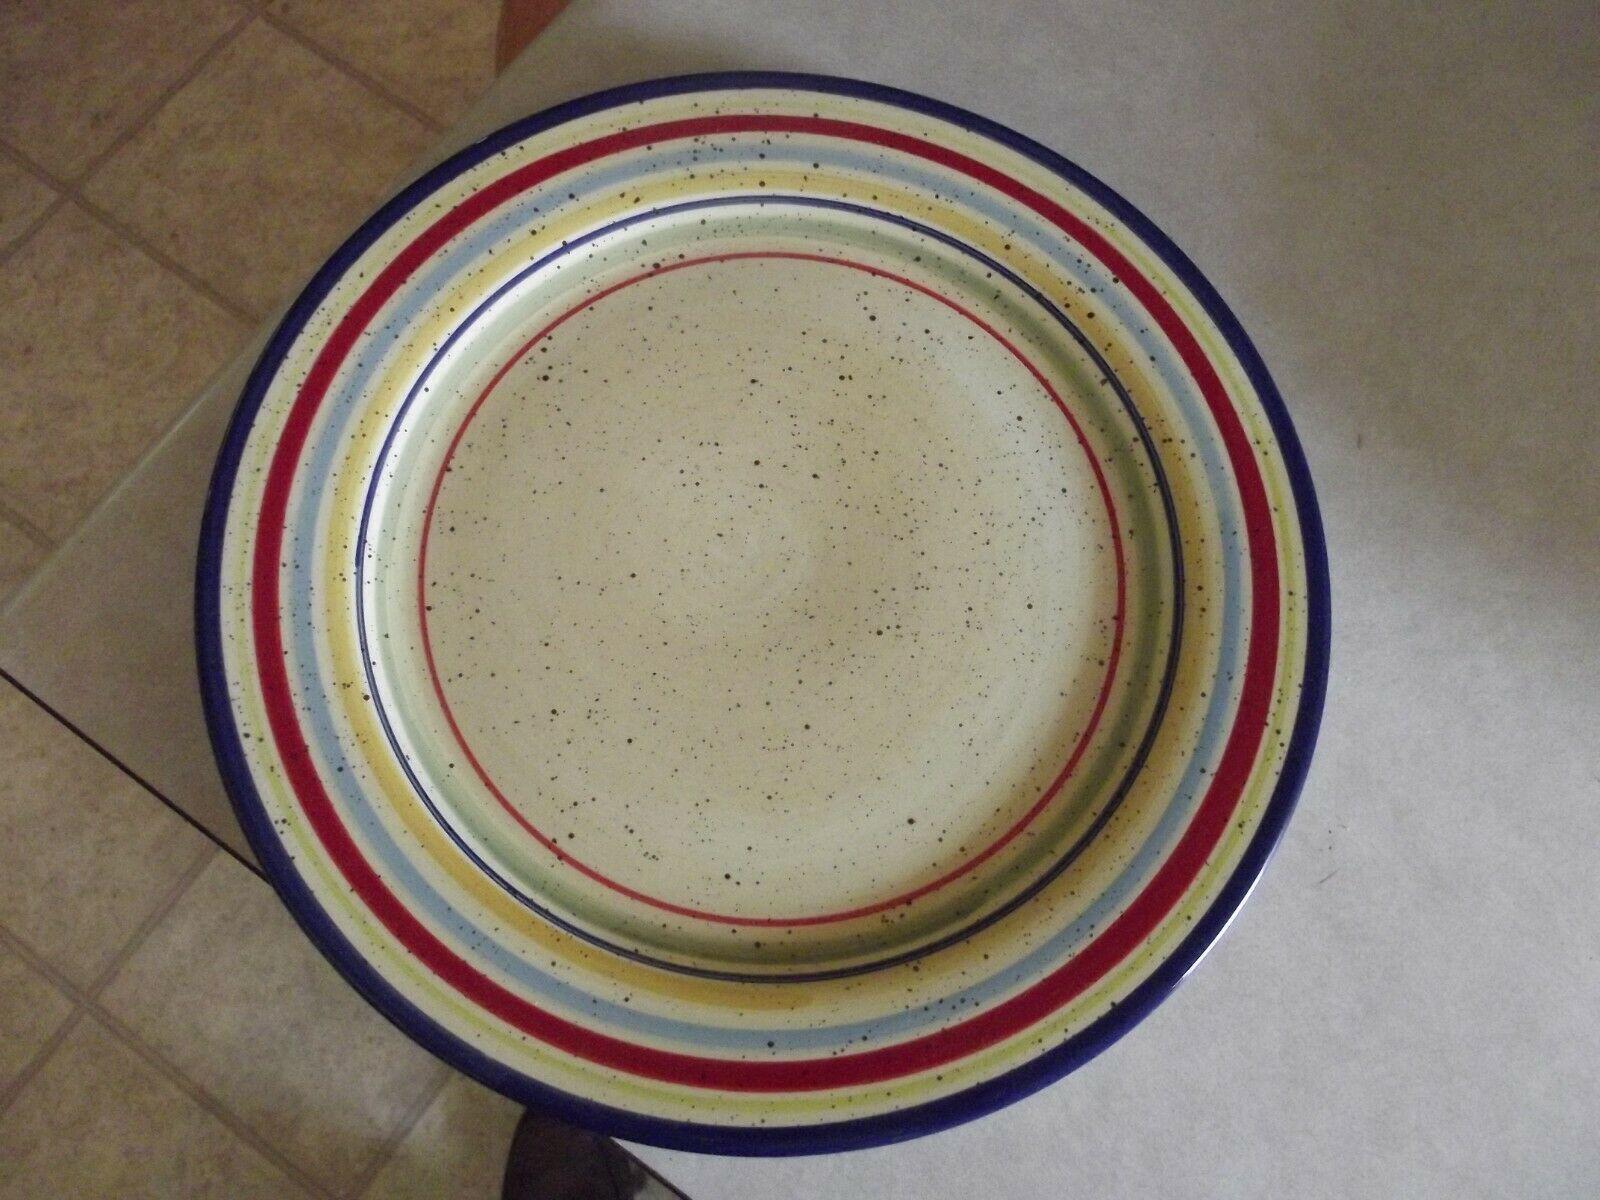 Pfaltzgraff Sedona dinner plate 6 available - $9.85